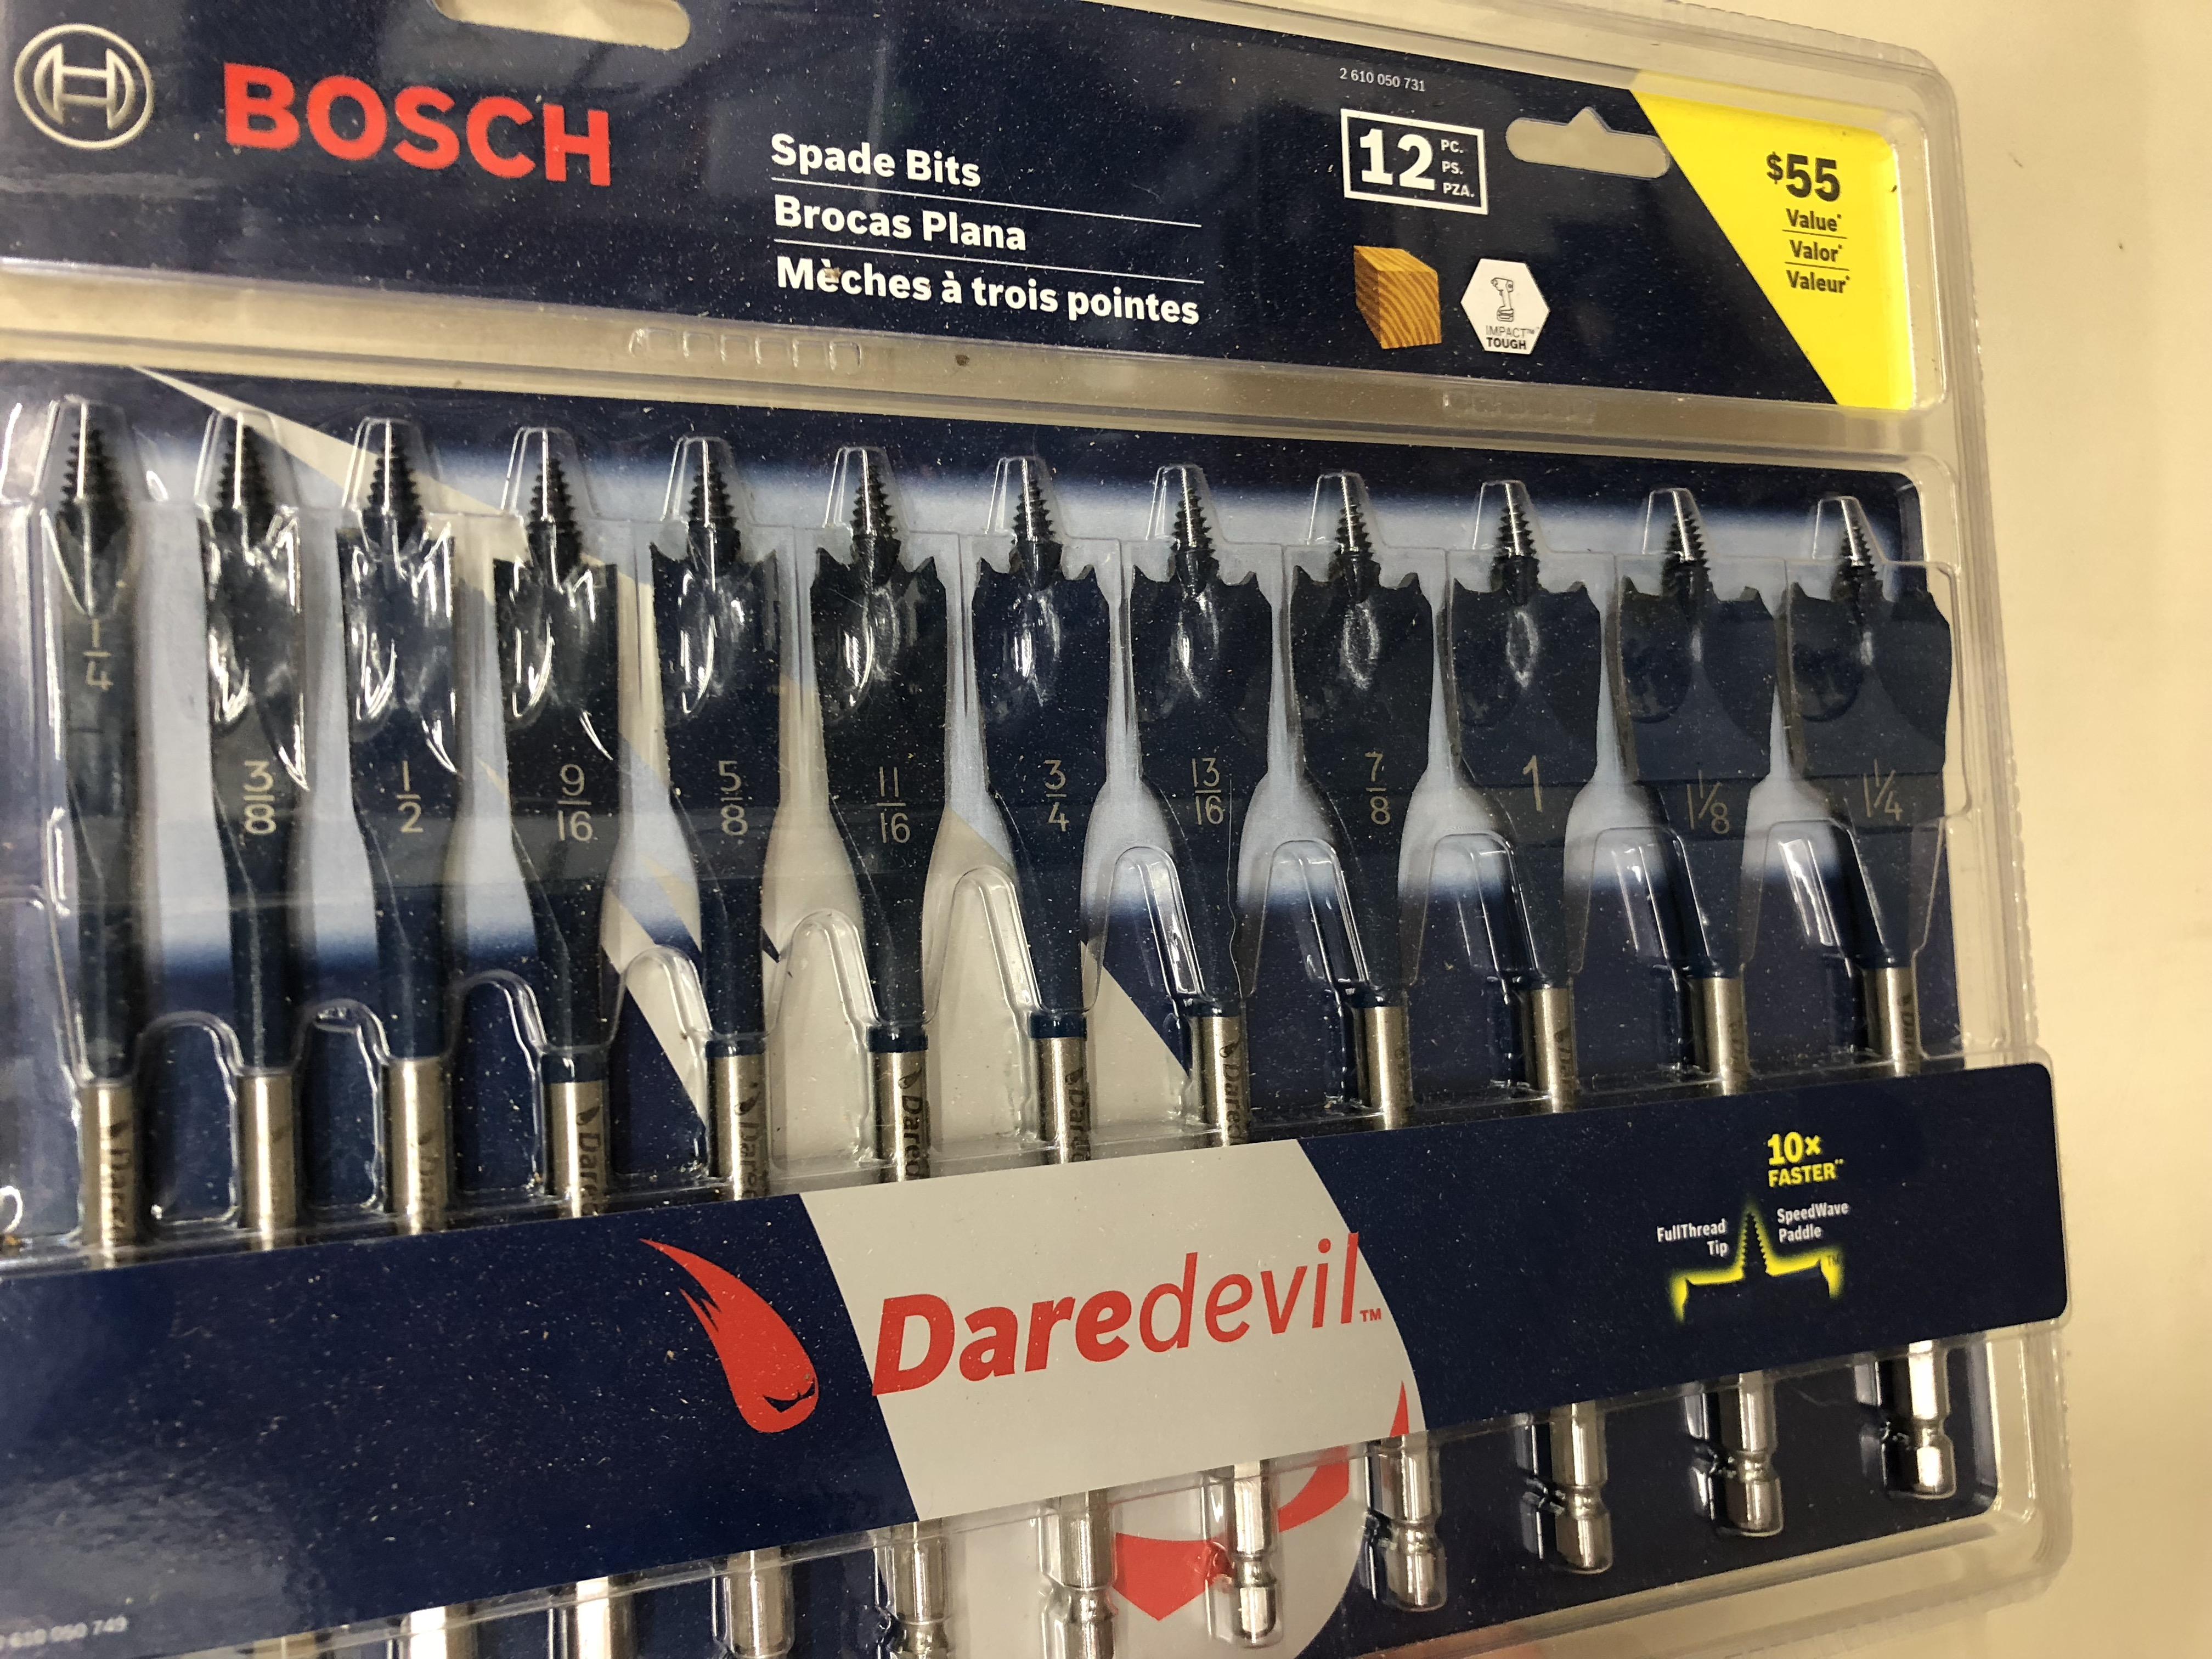 Bosch Daredevil Bits Review- #THDProSpective